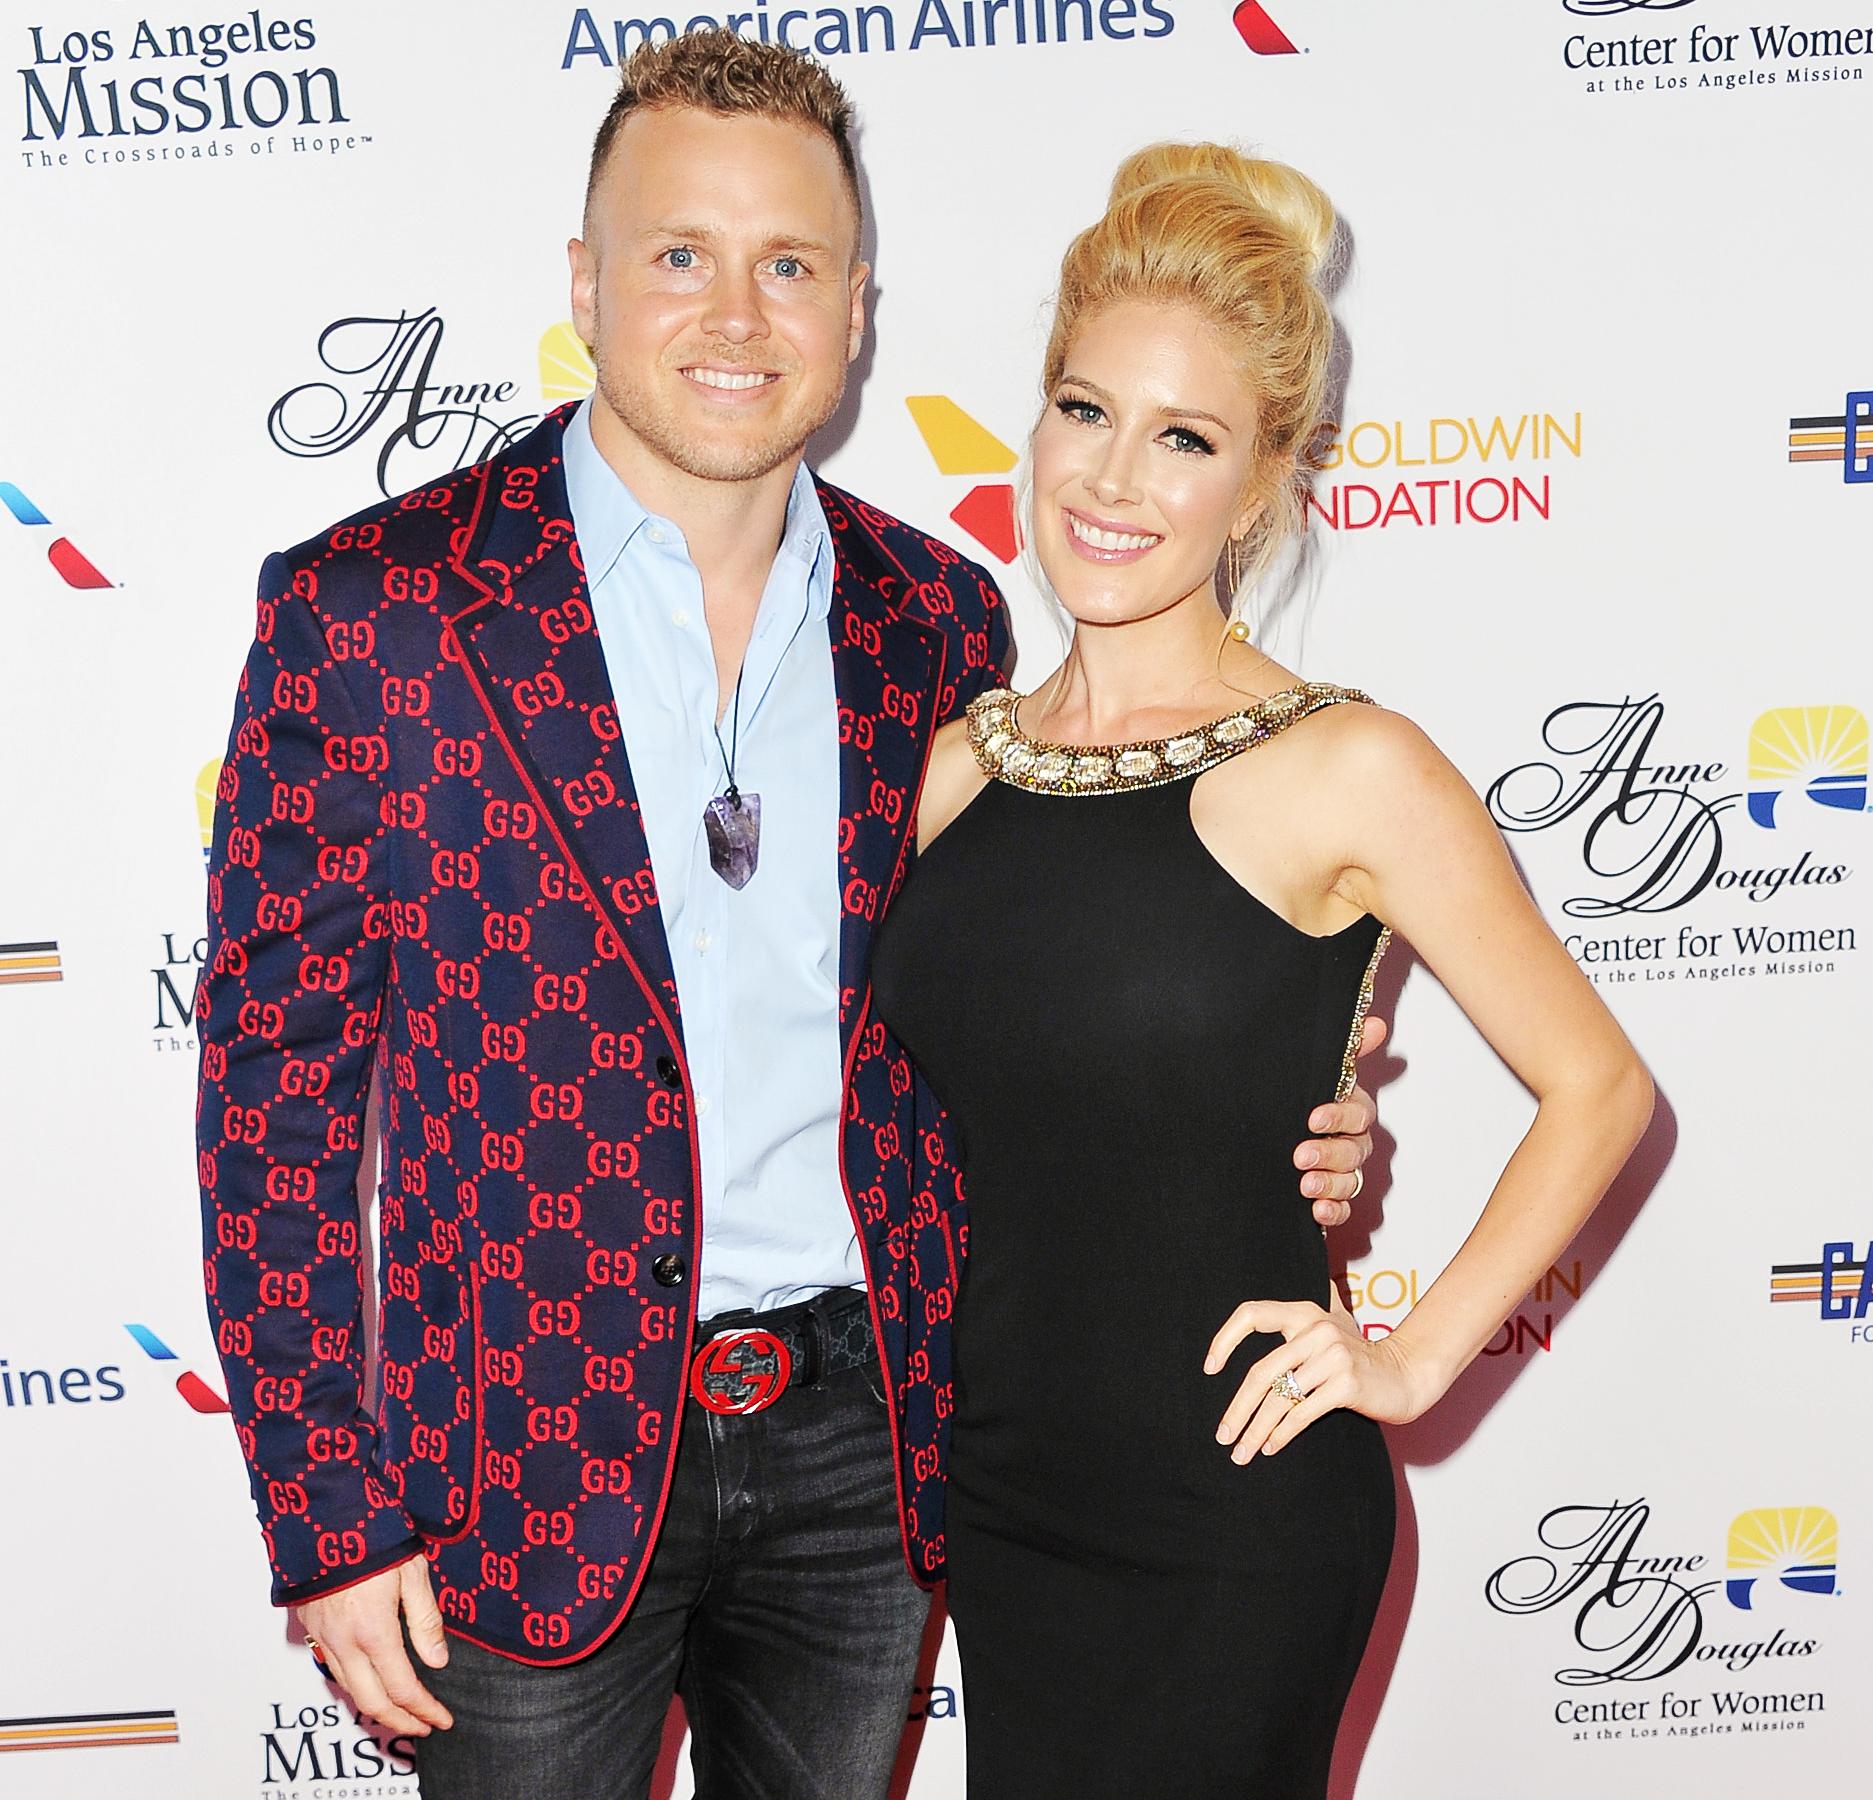 Stephanie Pratt Shades Spencer Pratt - Spencer Pratt and Heidi Pratt attend the Los Angeles Mission Legacy of Vision gala at The Beverly Hilton Hotel on October 25, 2018 in Beverly Hills, California.